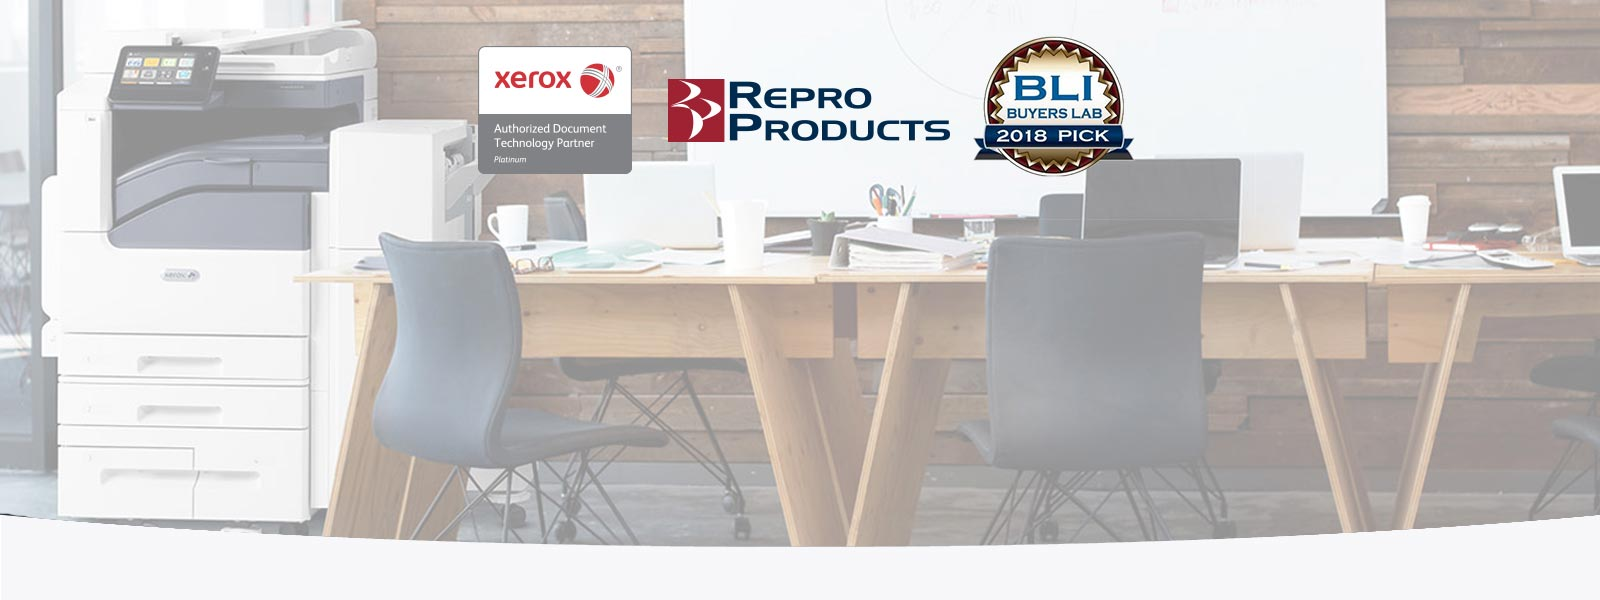 Xerox 2018 Winter Picks   Repro Products